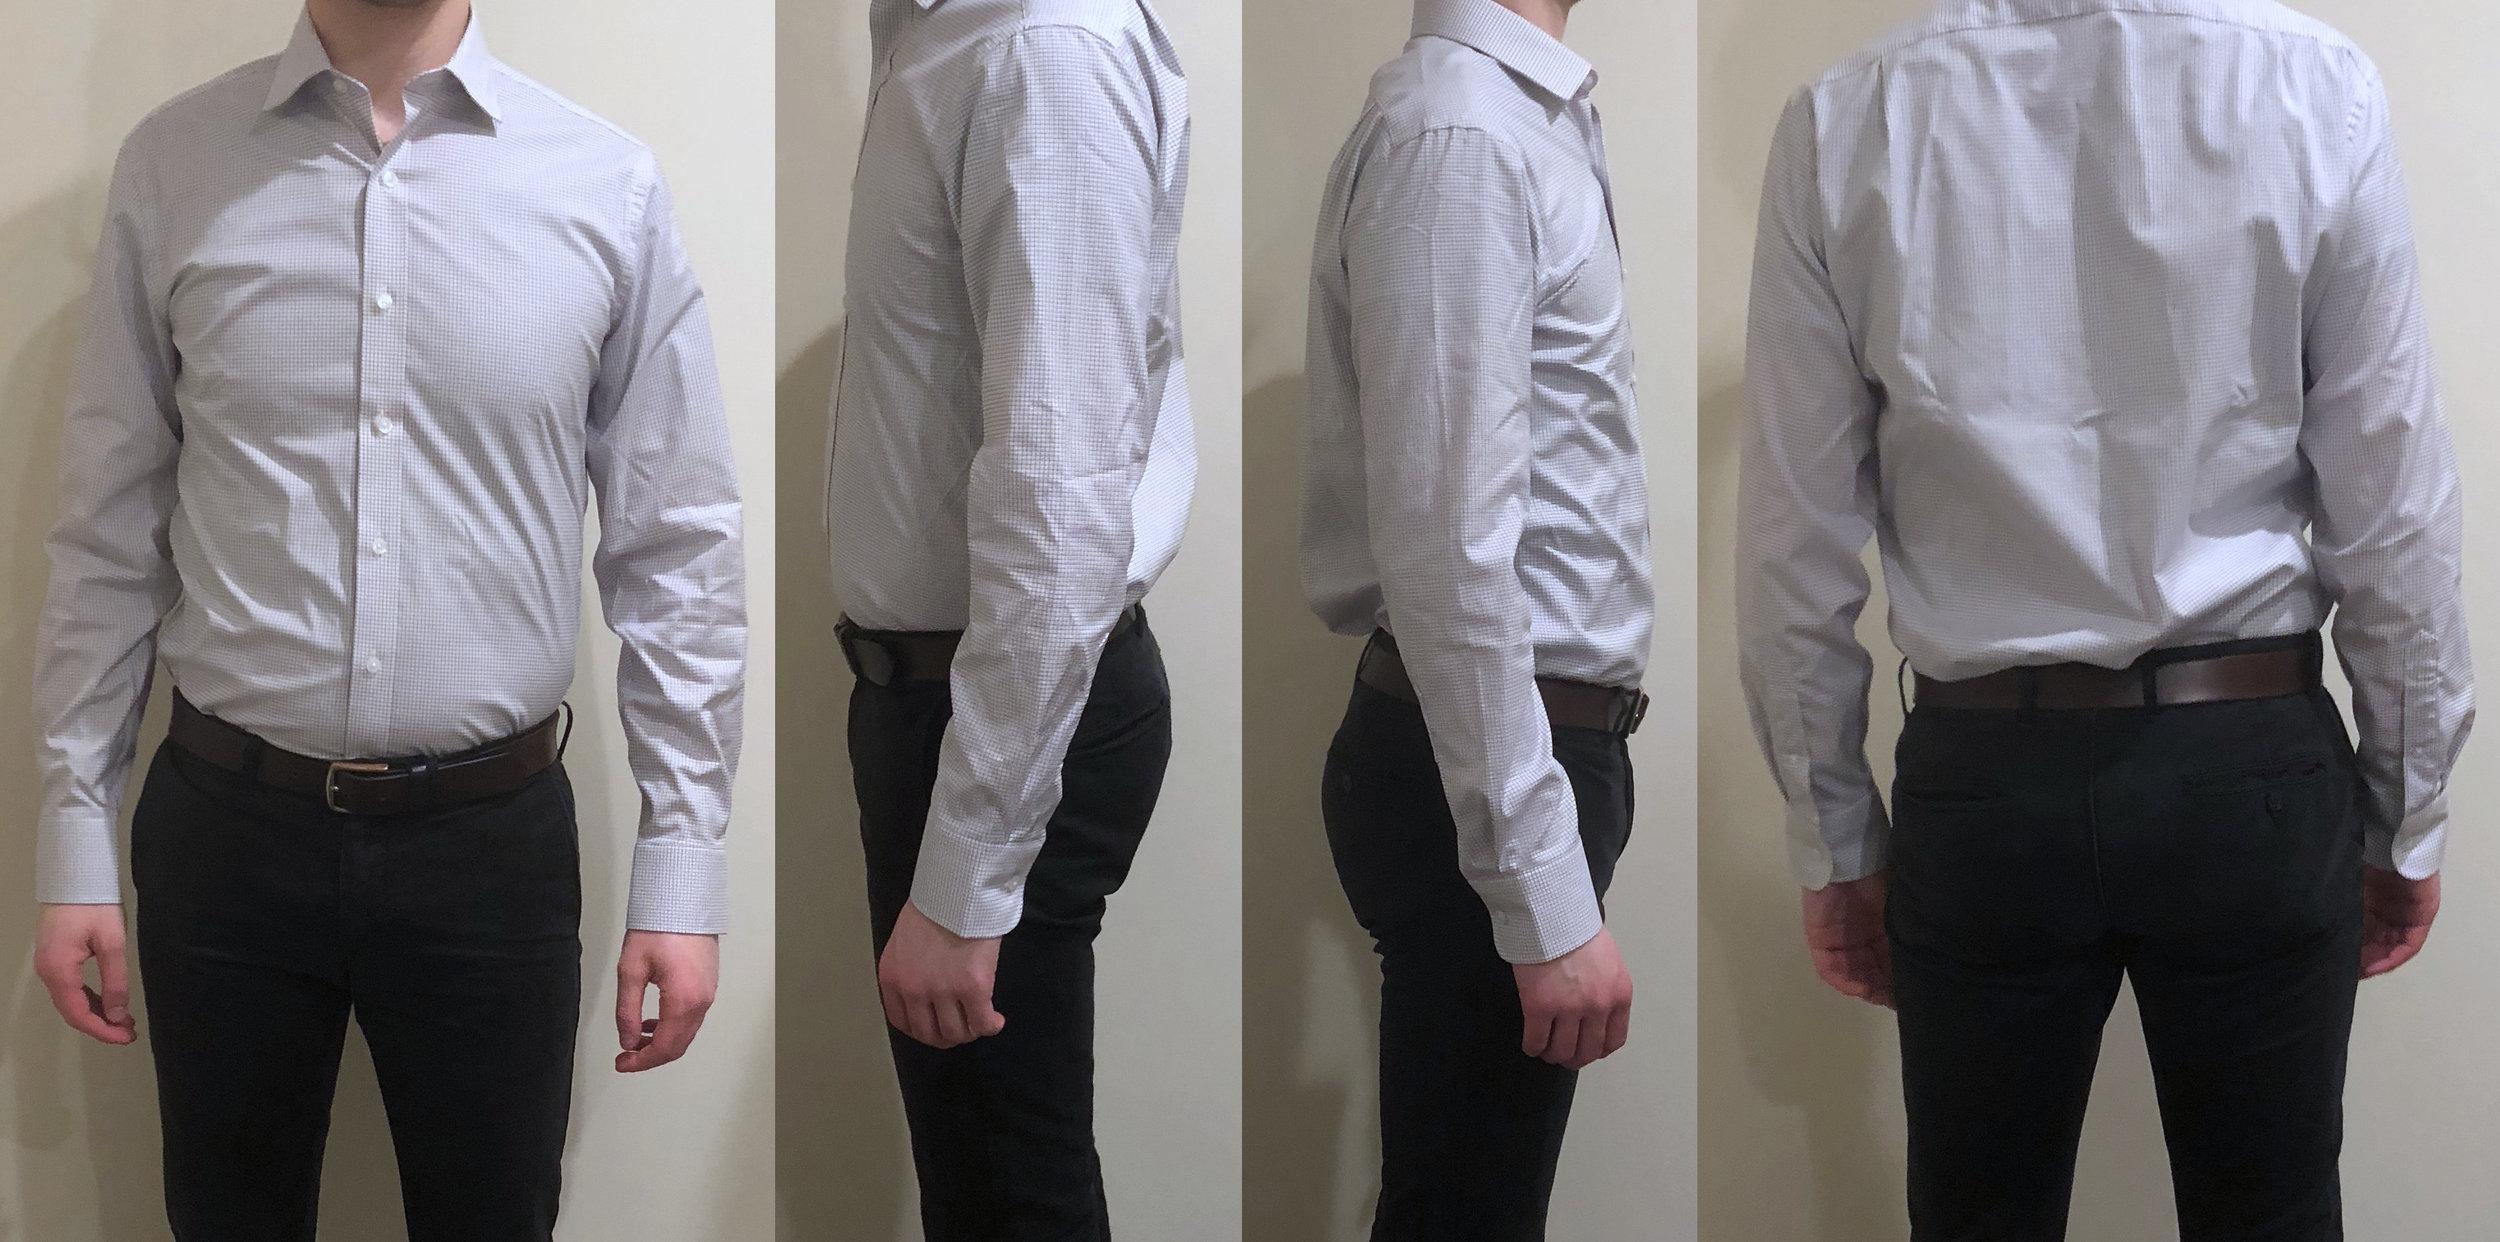 Size 15/33 fit pics